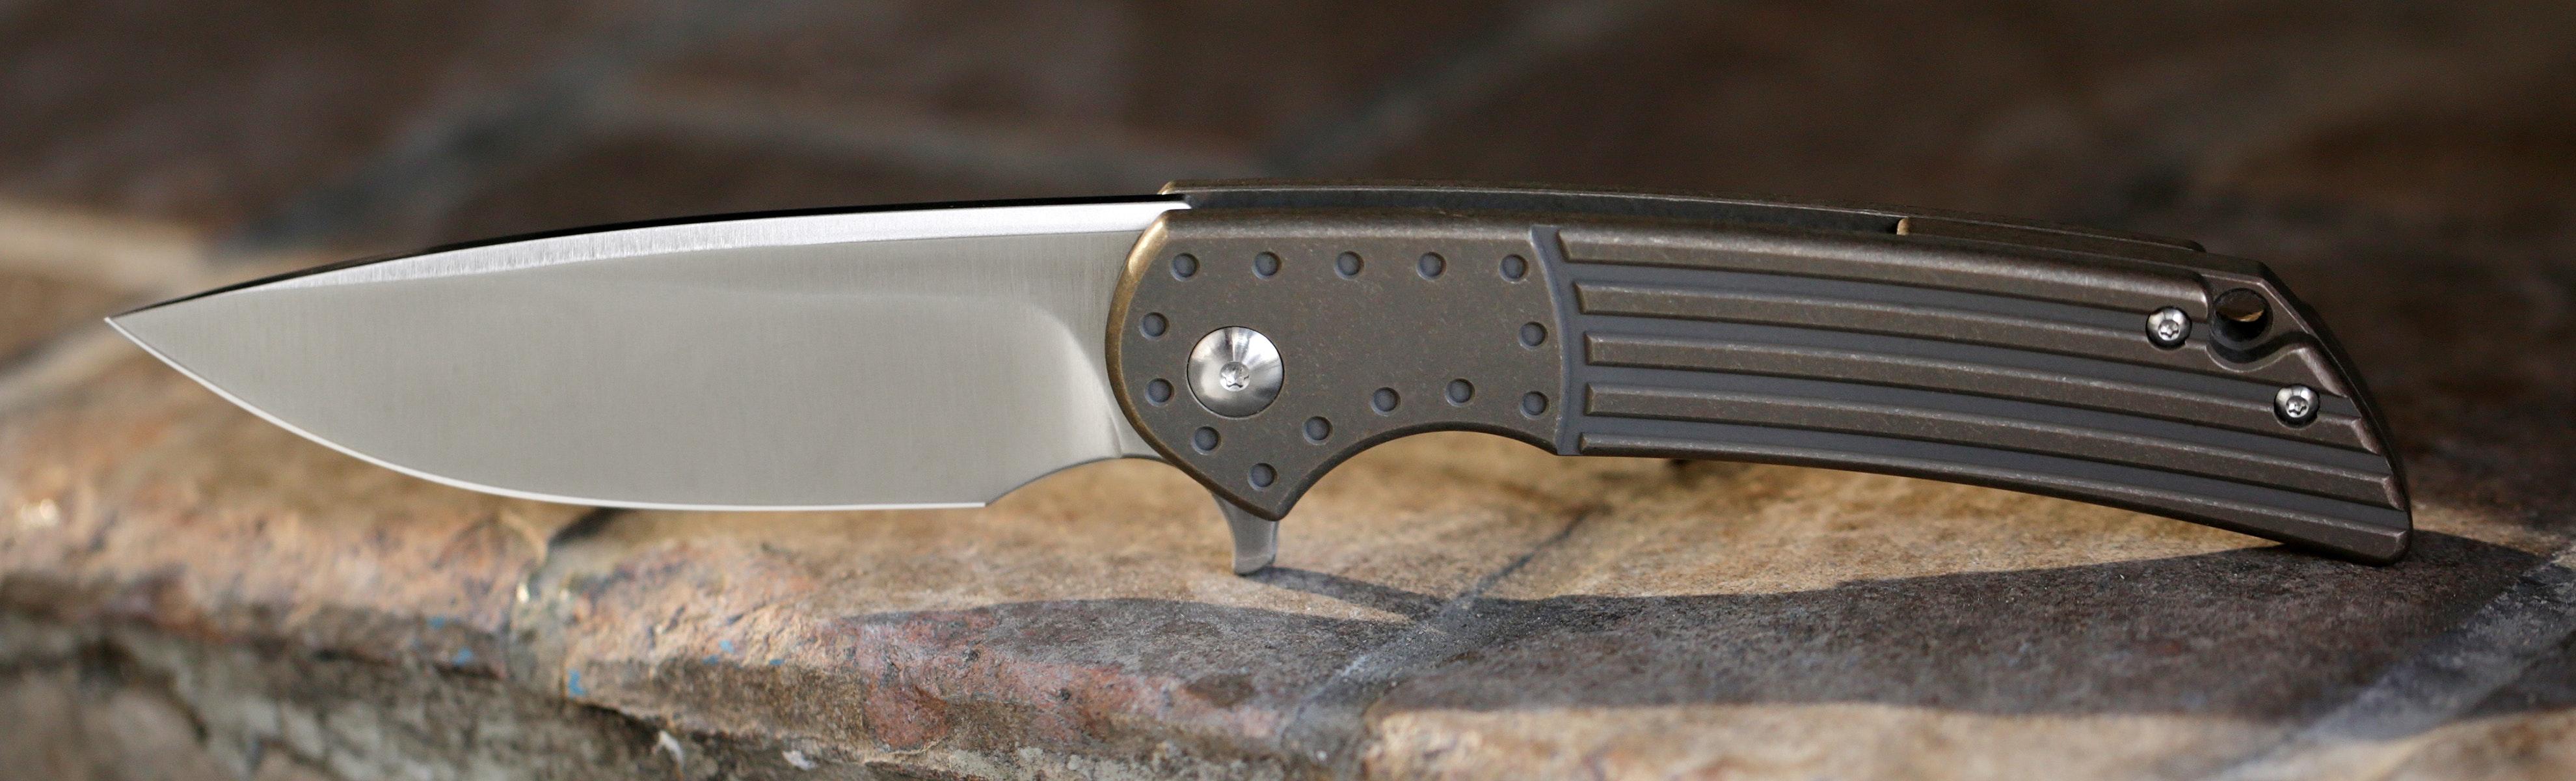 Massdrop x Ferrum Forge Crux S35VN Folding Knife